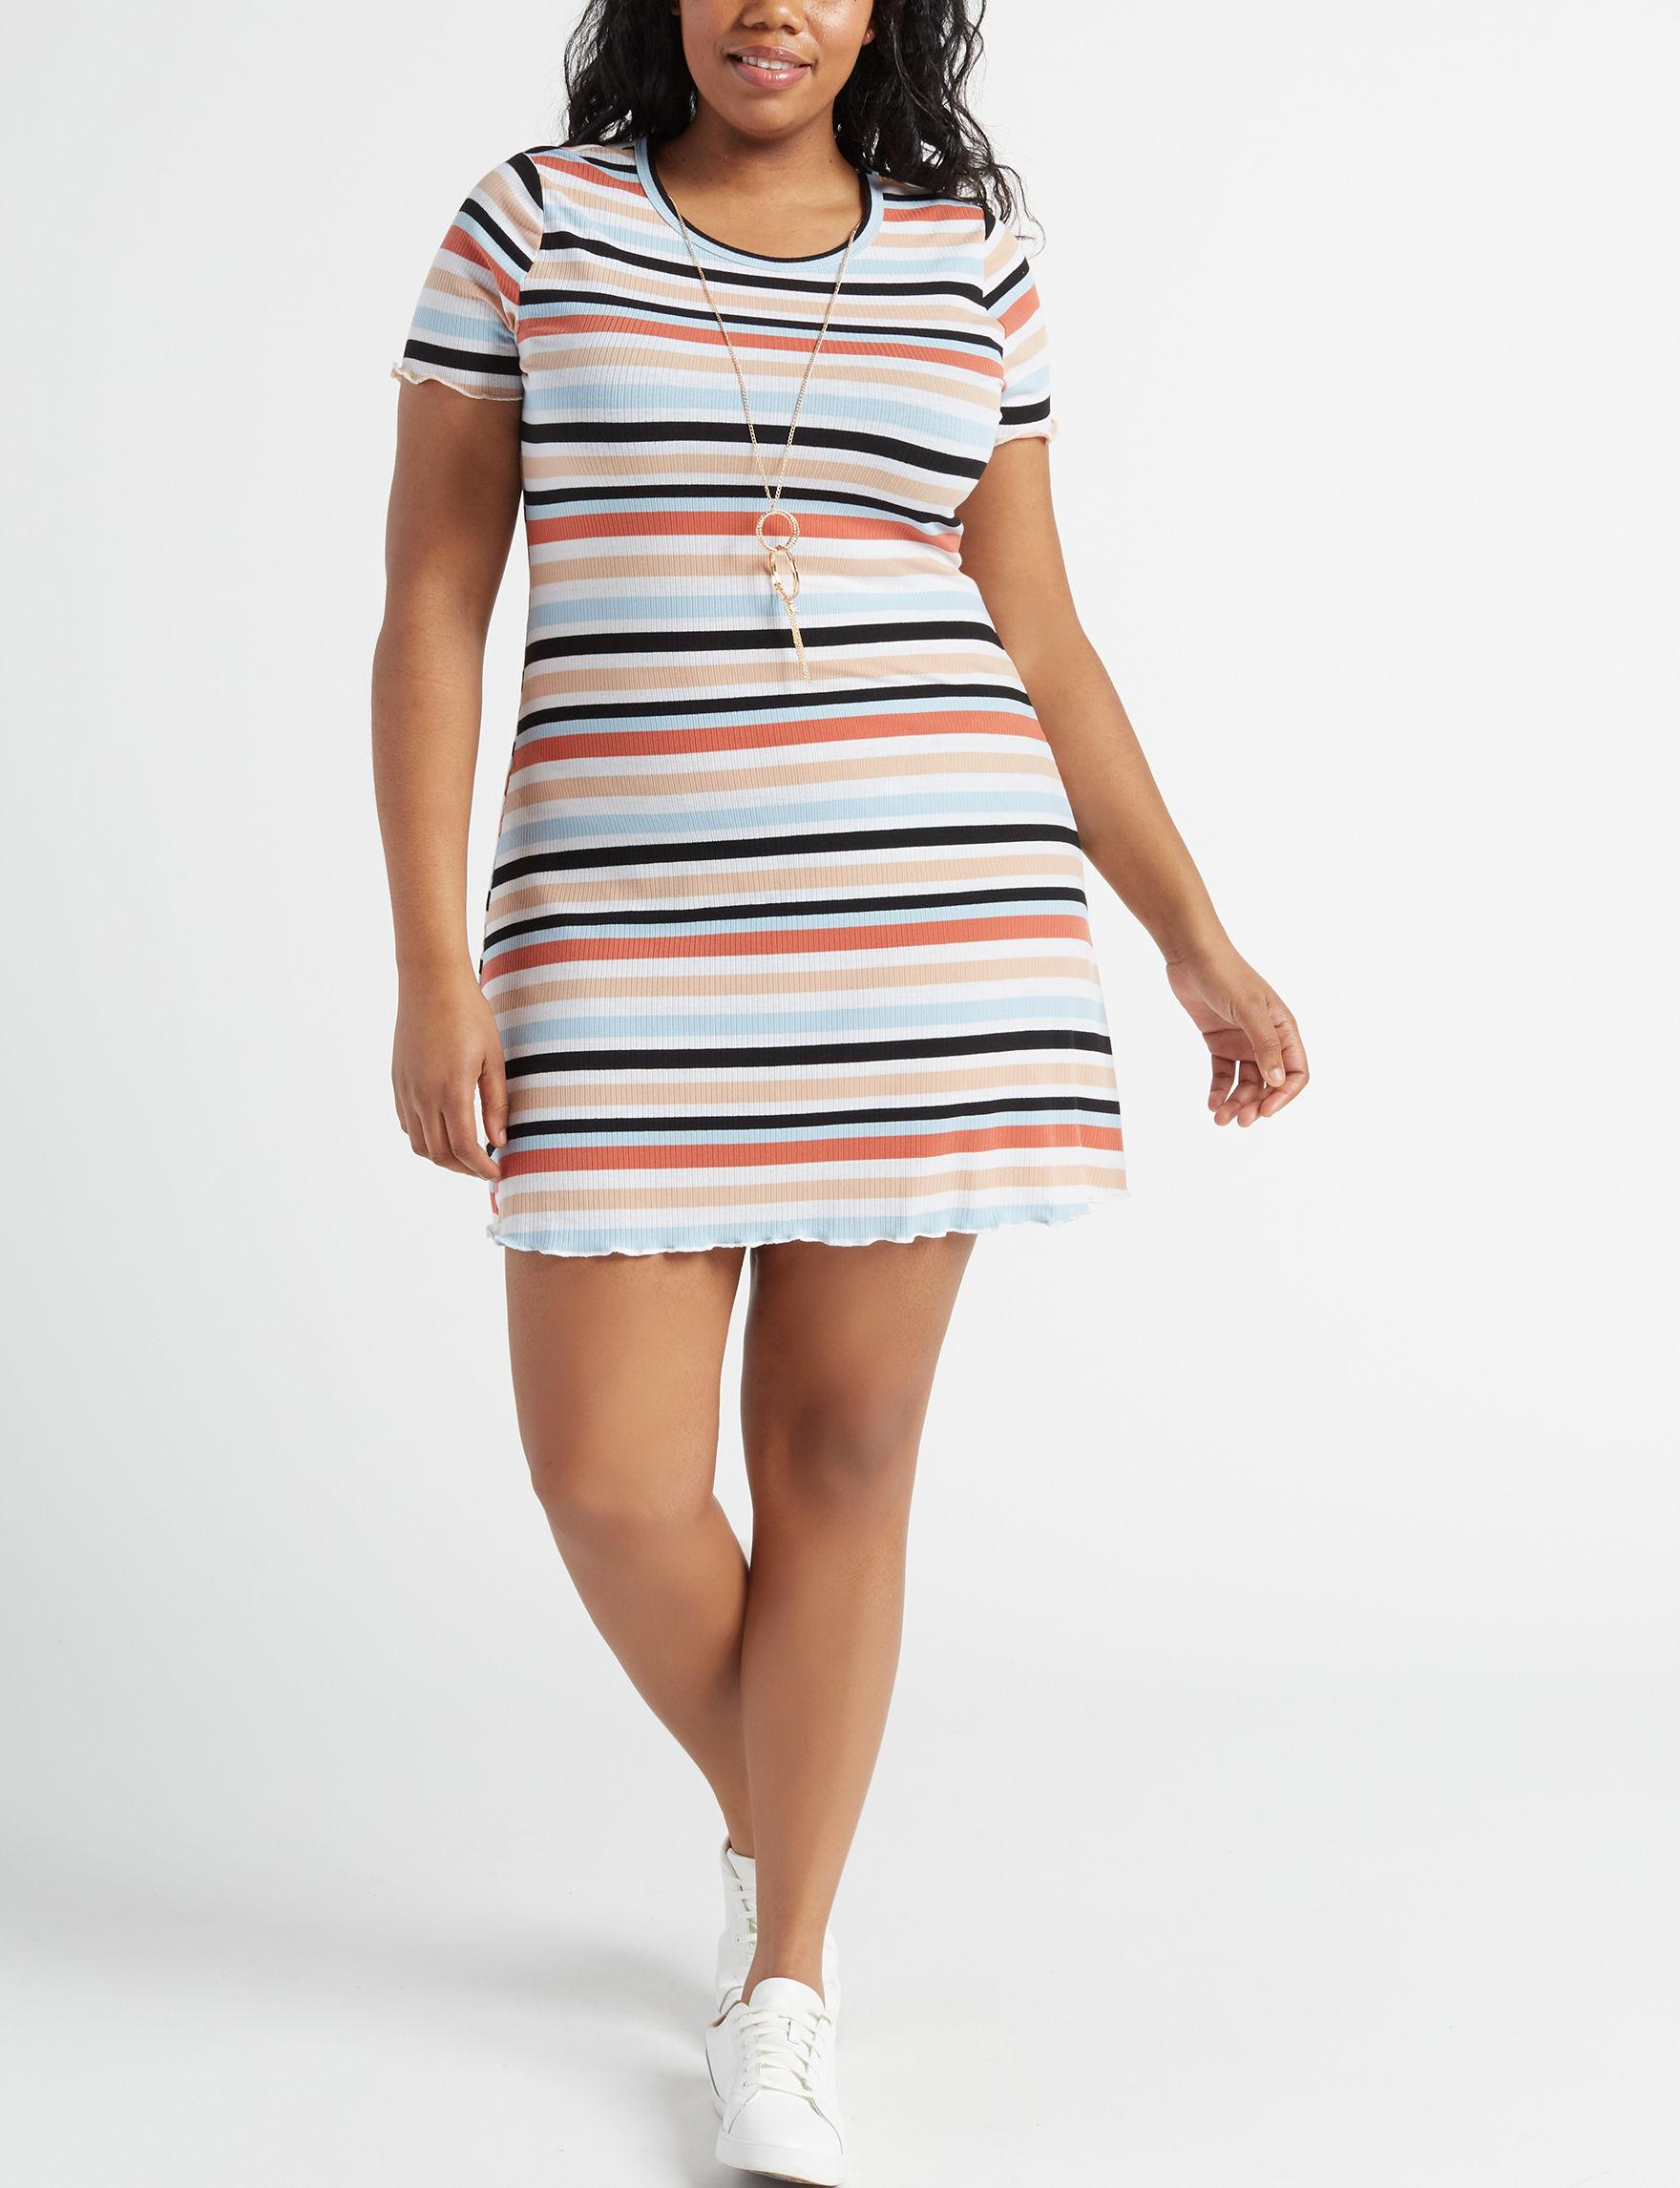 Wishful Park White Multi Everyday & Casual Shift Dresses